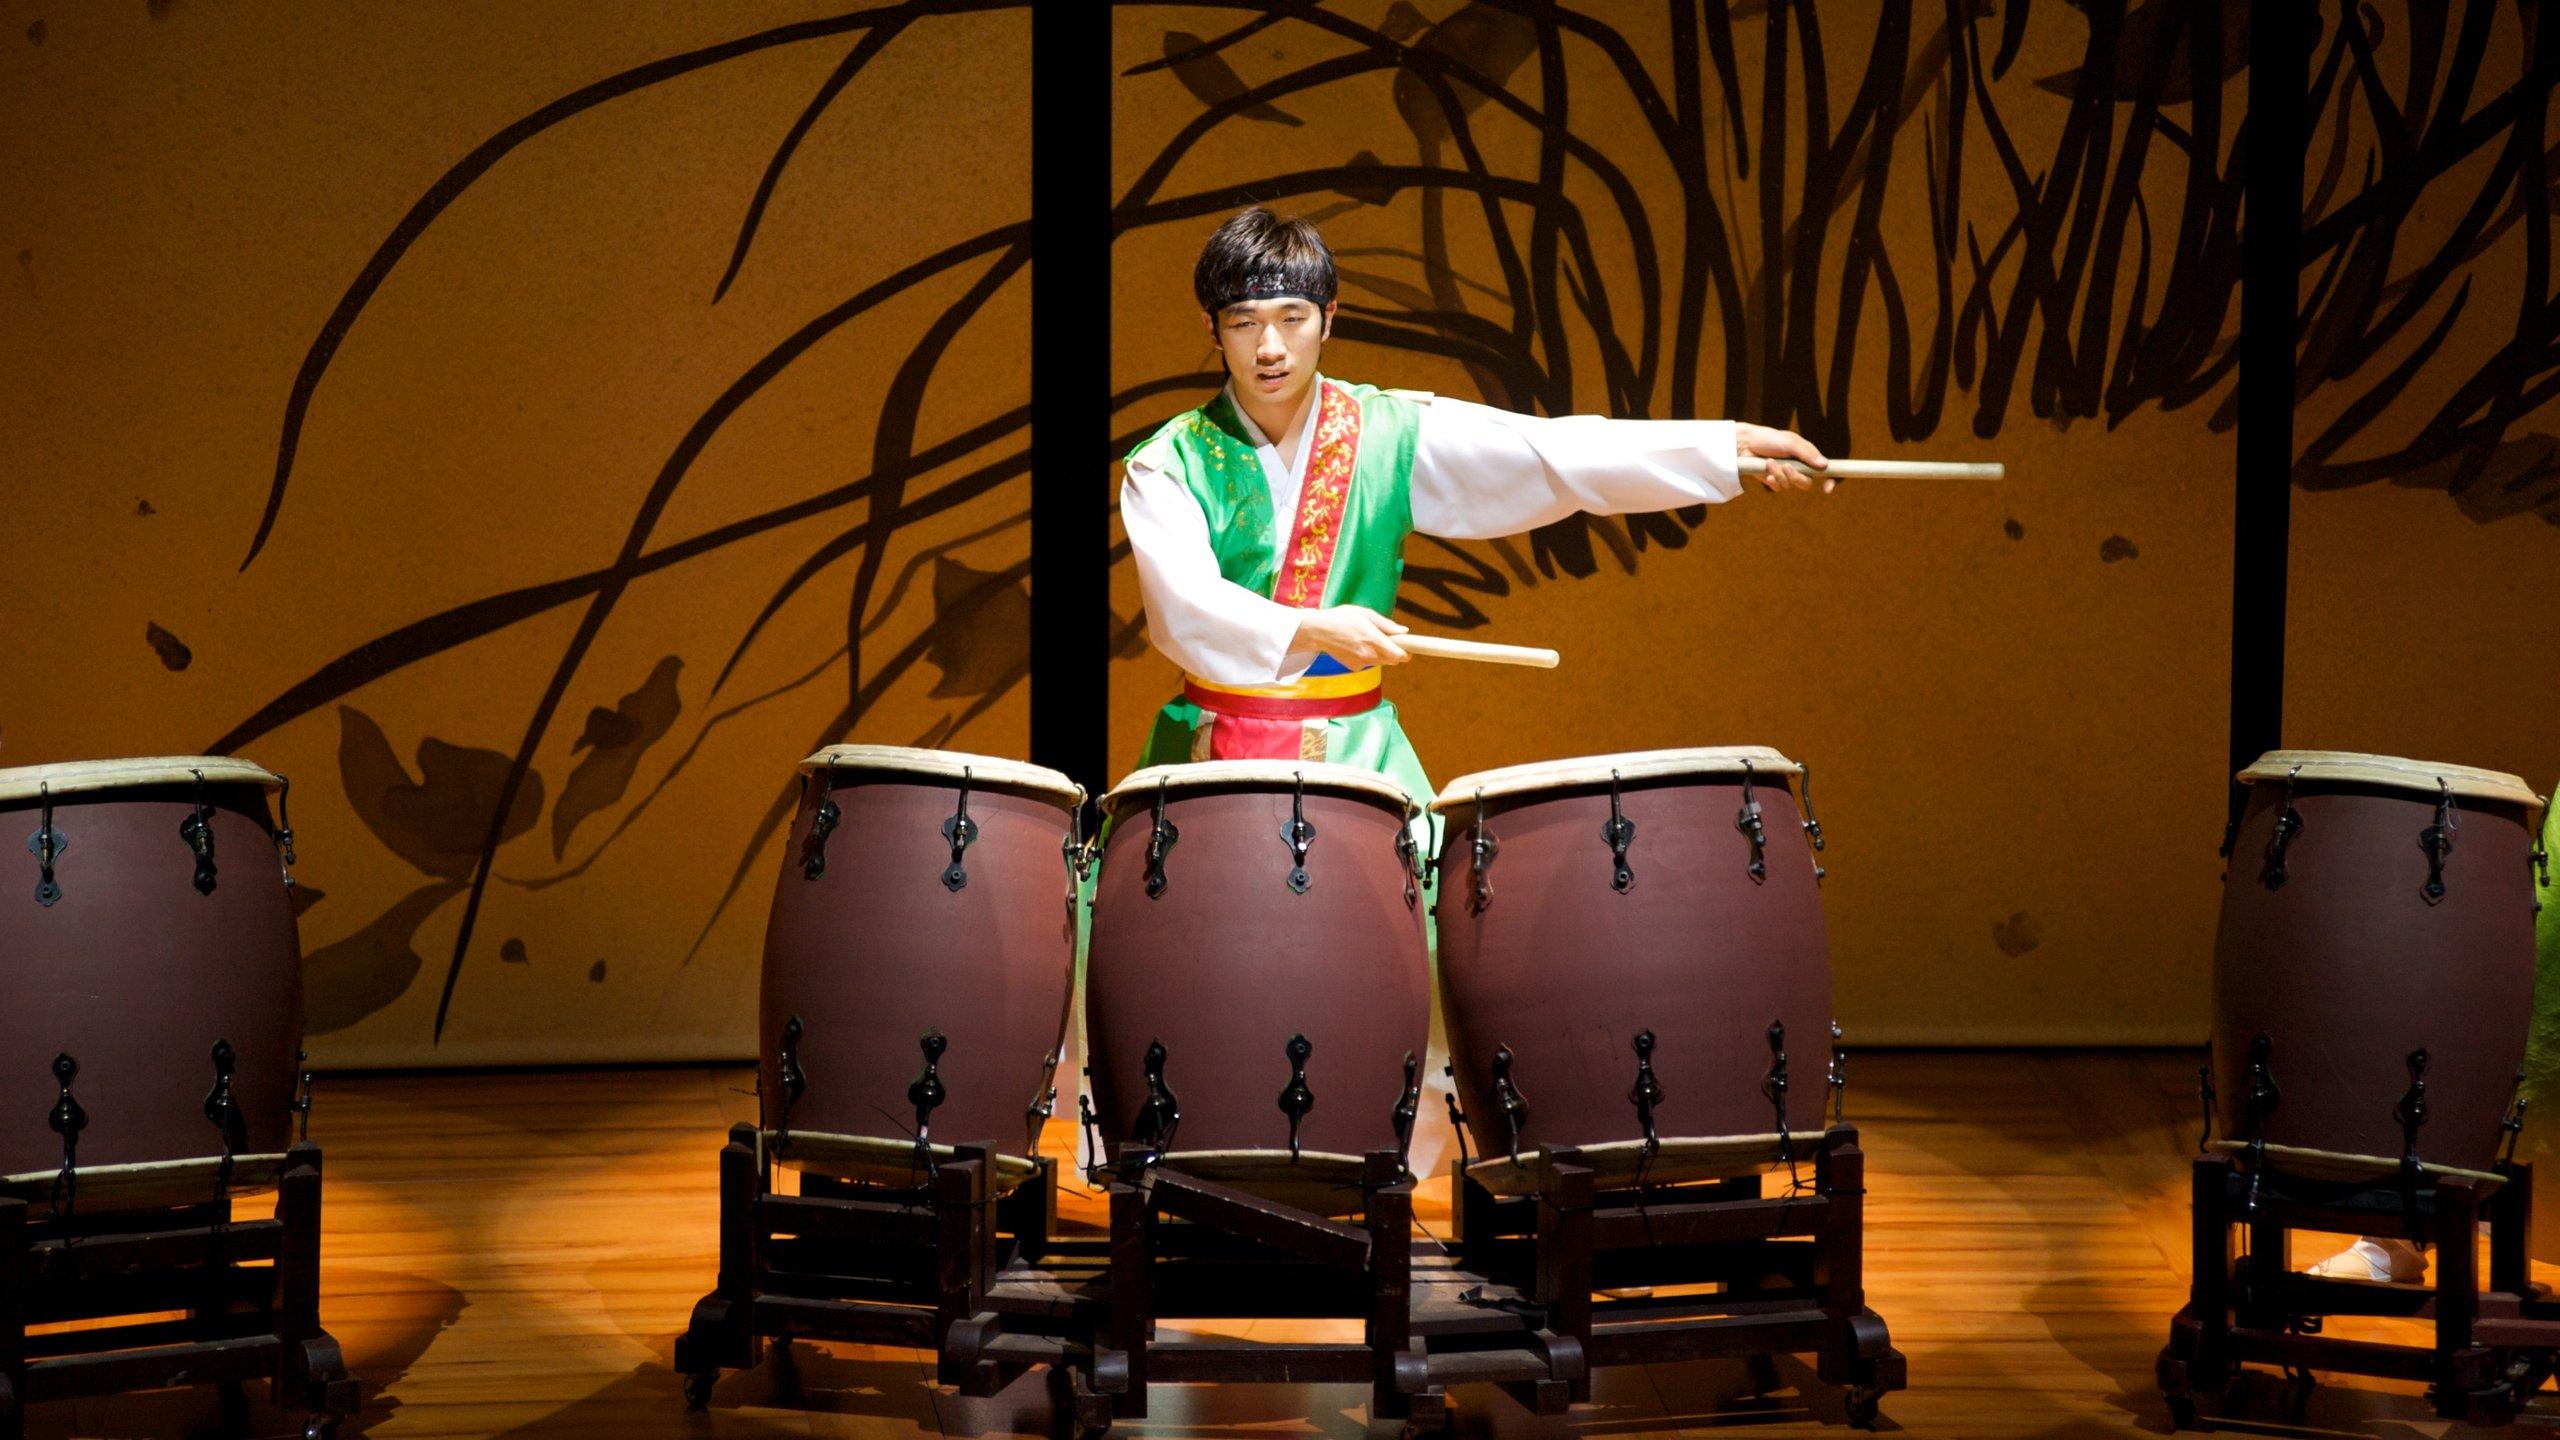 Chongdong-theater, Seoel, Zuid-Korea